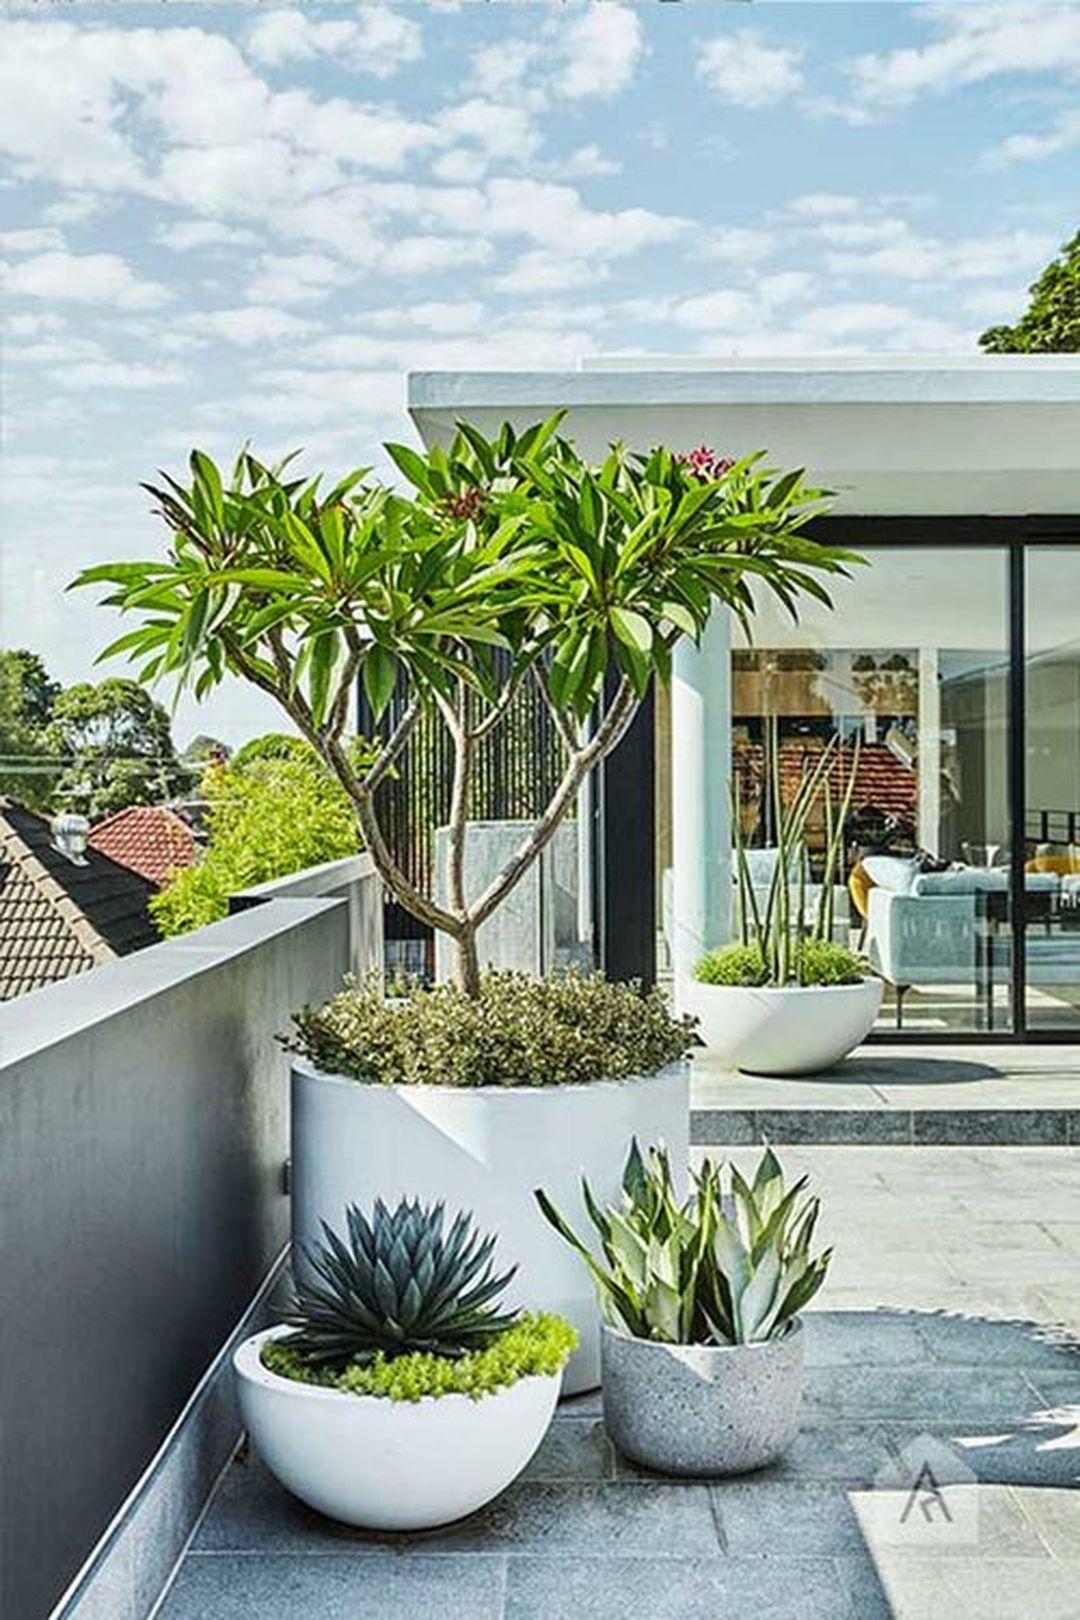 Modern Mediterranean Backyard Makeover On A Budget ... on Modern Backyard Ideas On A Budget id=36440